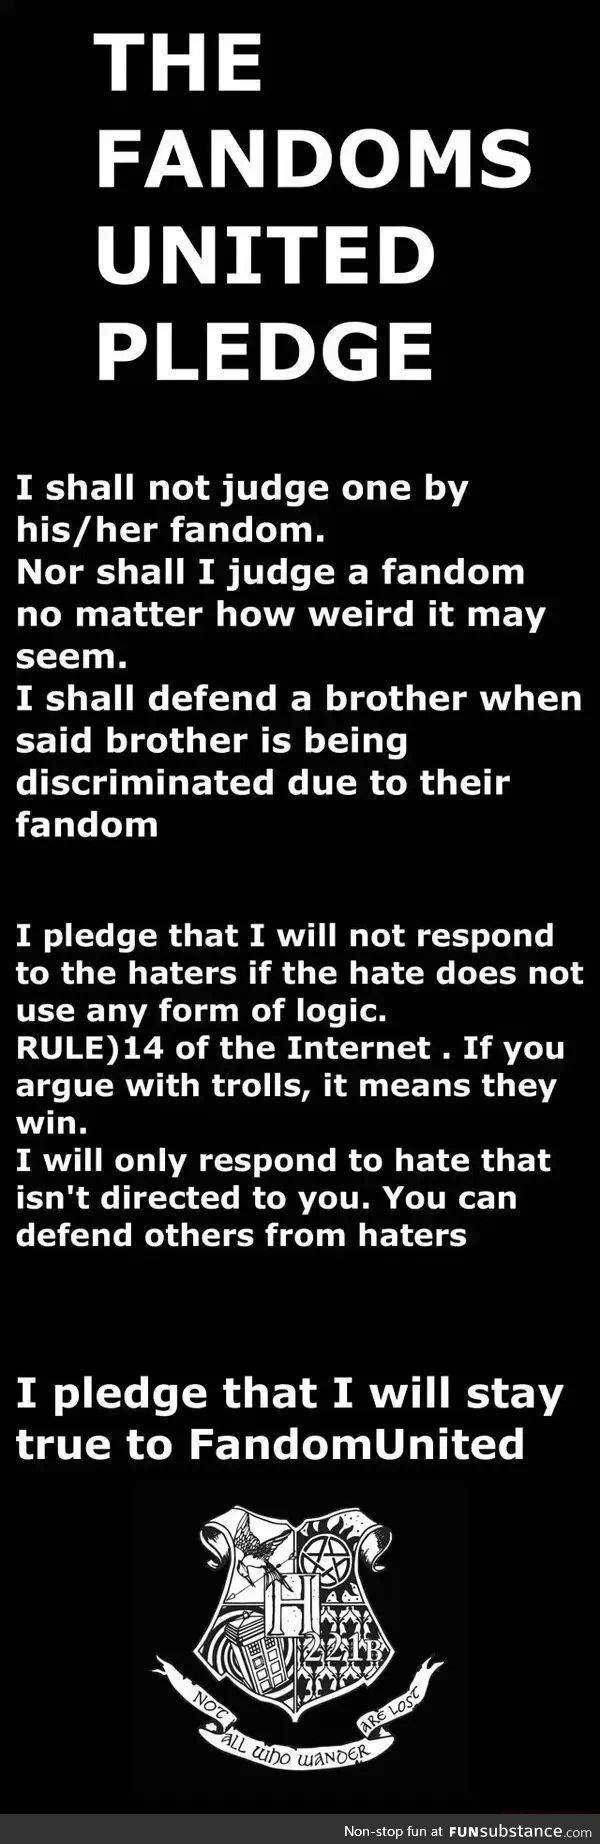 I Pledge Allegiance To The Fandom Funsubstance Com Unite Book Fandoms What Doe Mean Of Me Republic In Justice